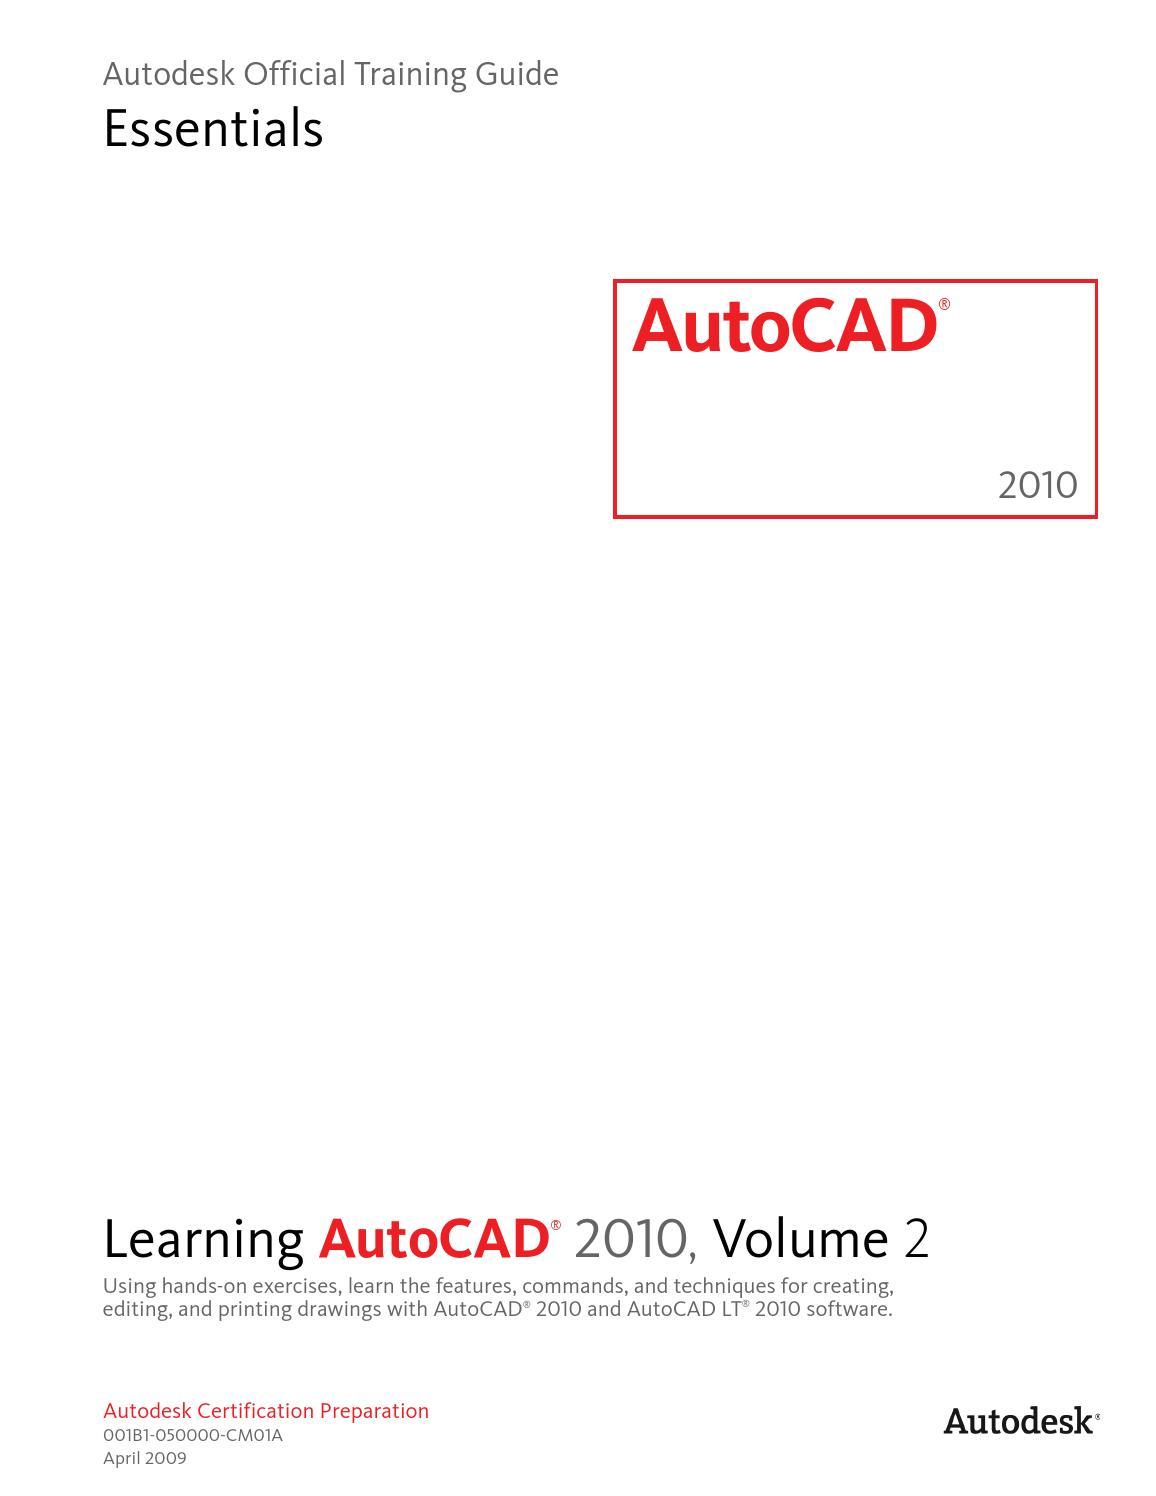 Learning autocad 2010 volume 2 by goga issuu biocorpaavc Choice Image